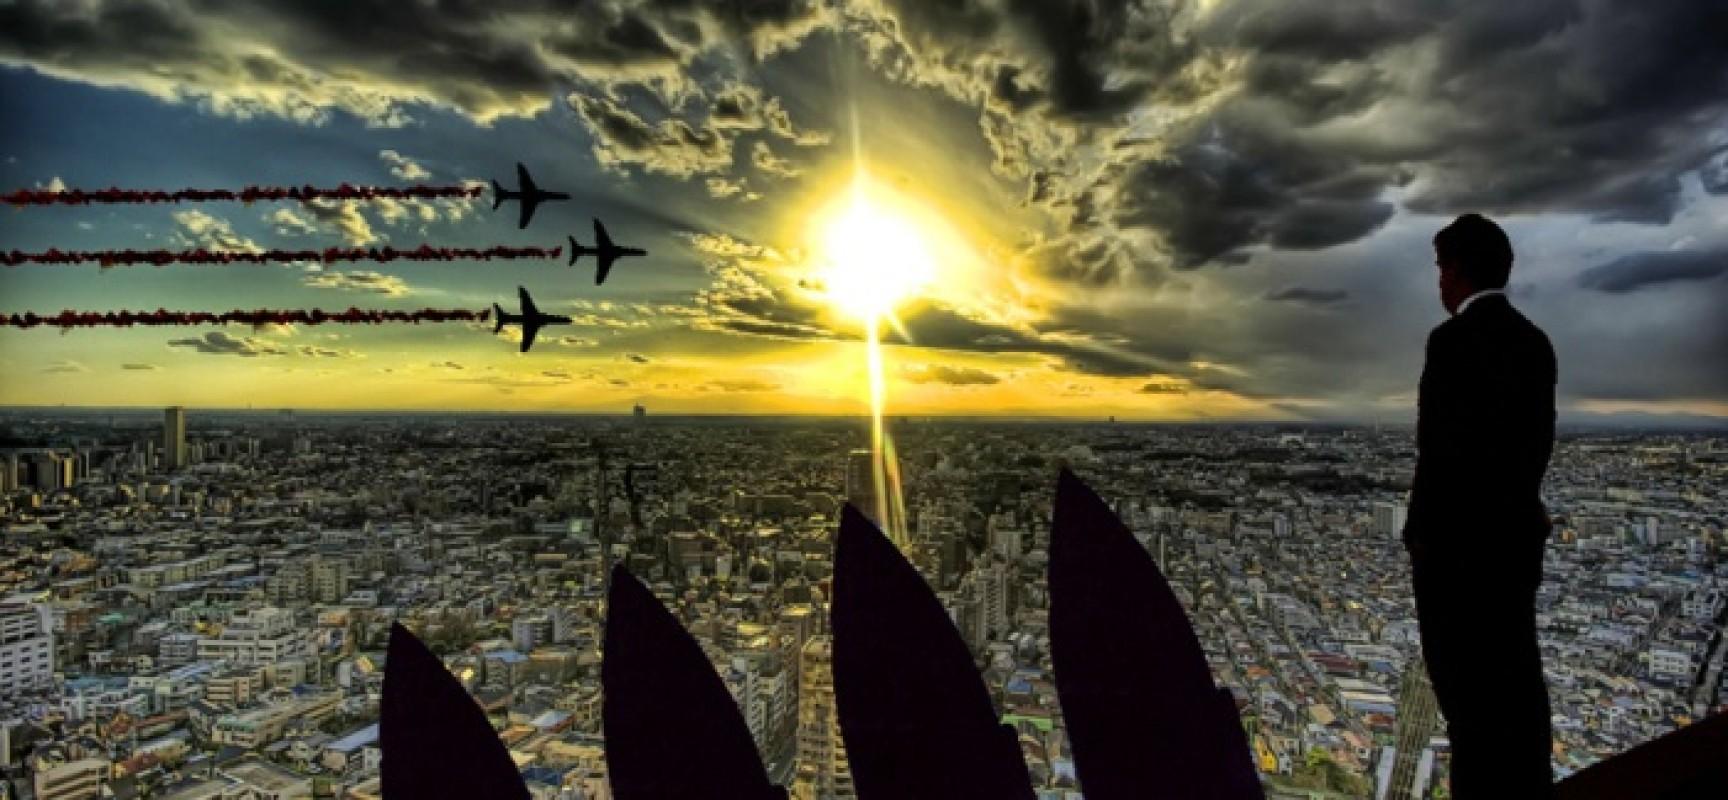 http://kingworldnews.com/wp-content/uploads/2015/02/King-World-News-Superpowers-Battle-Over-Greece-As-Europe-Trembles-With-Fear-Of-World-War-III-1728x800_c.jpg